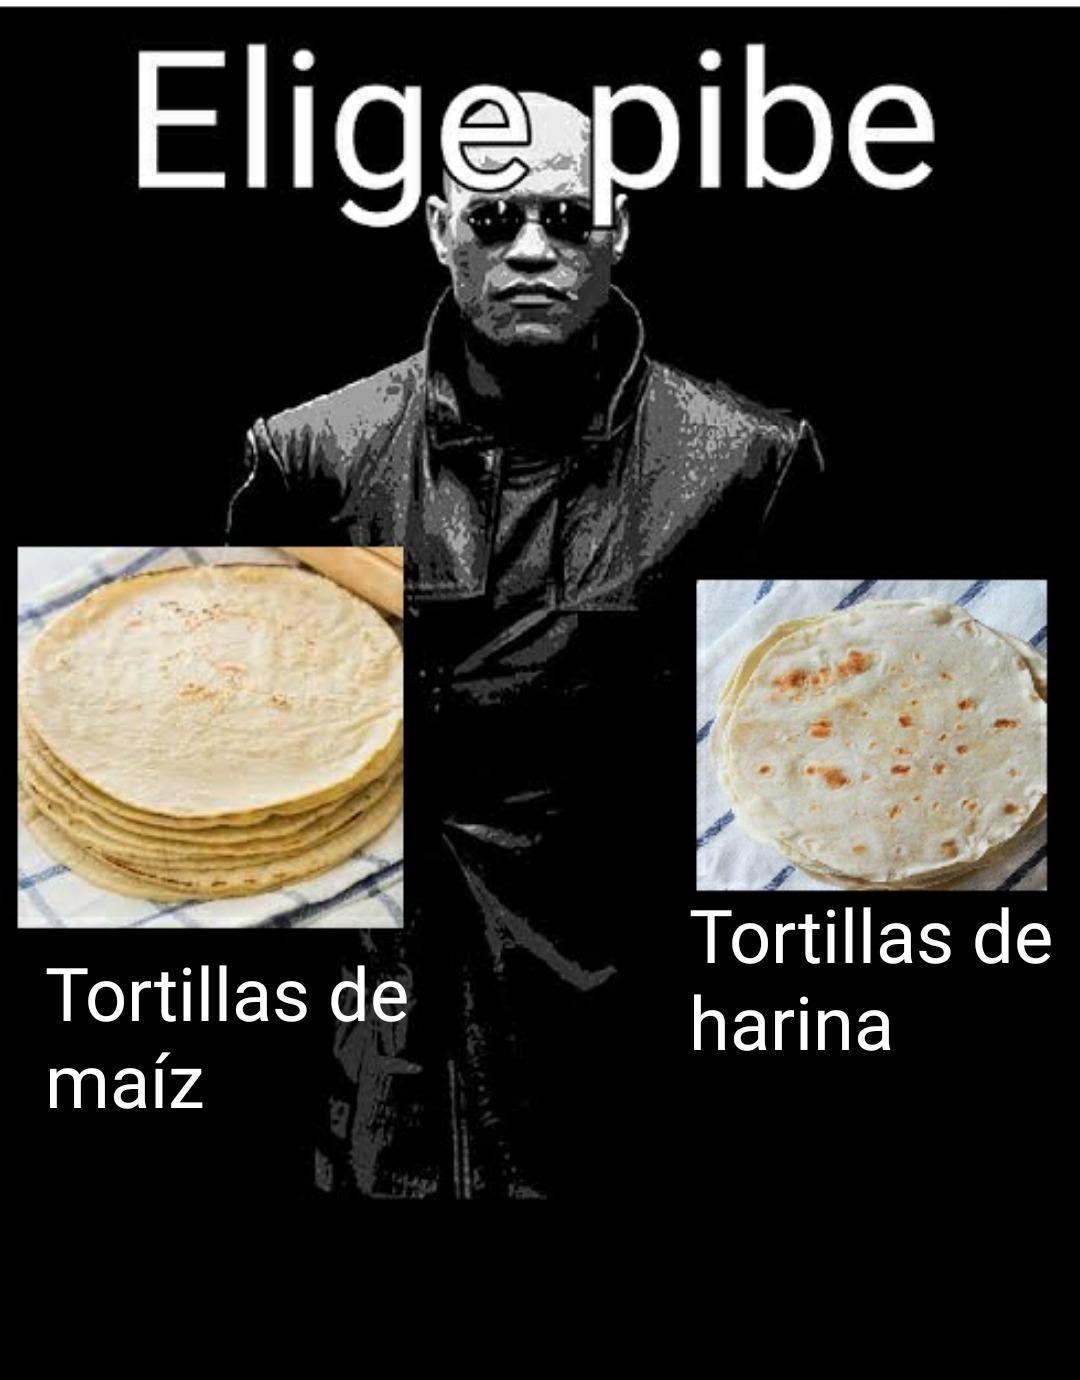 Elige tortillas de harina o de maiz - meme